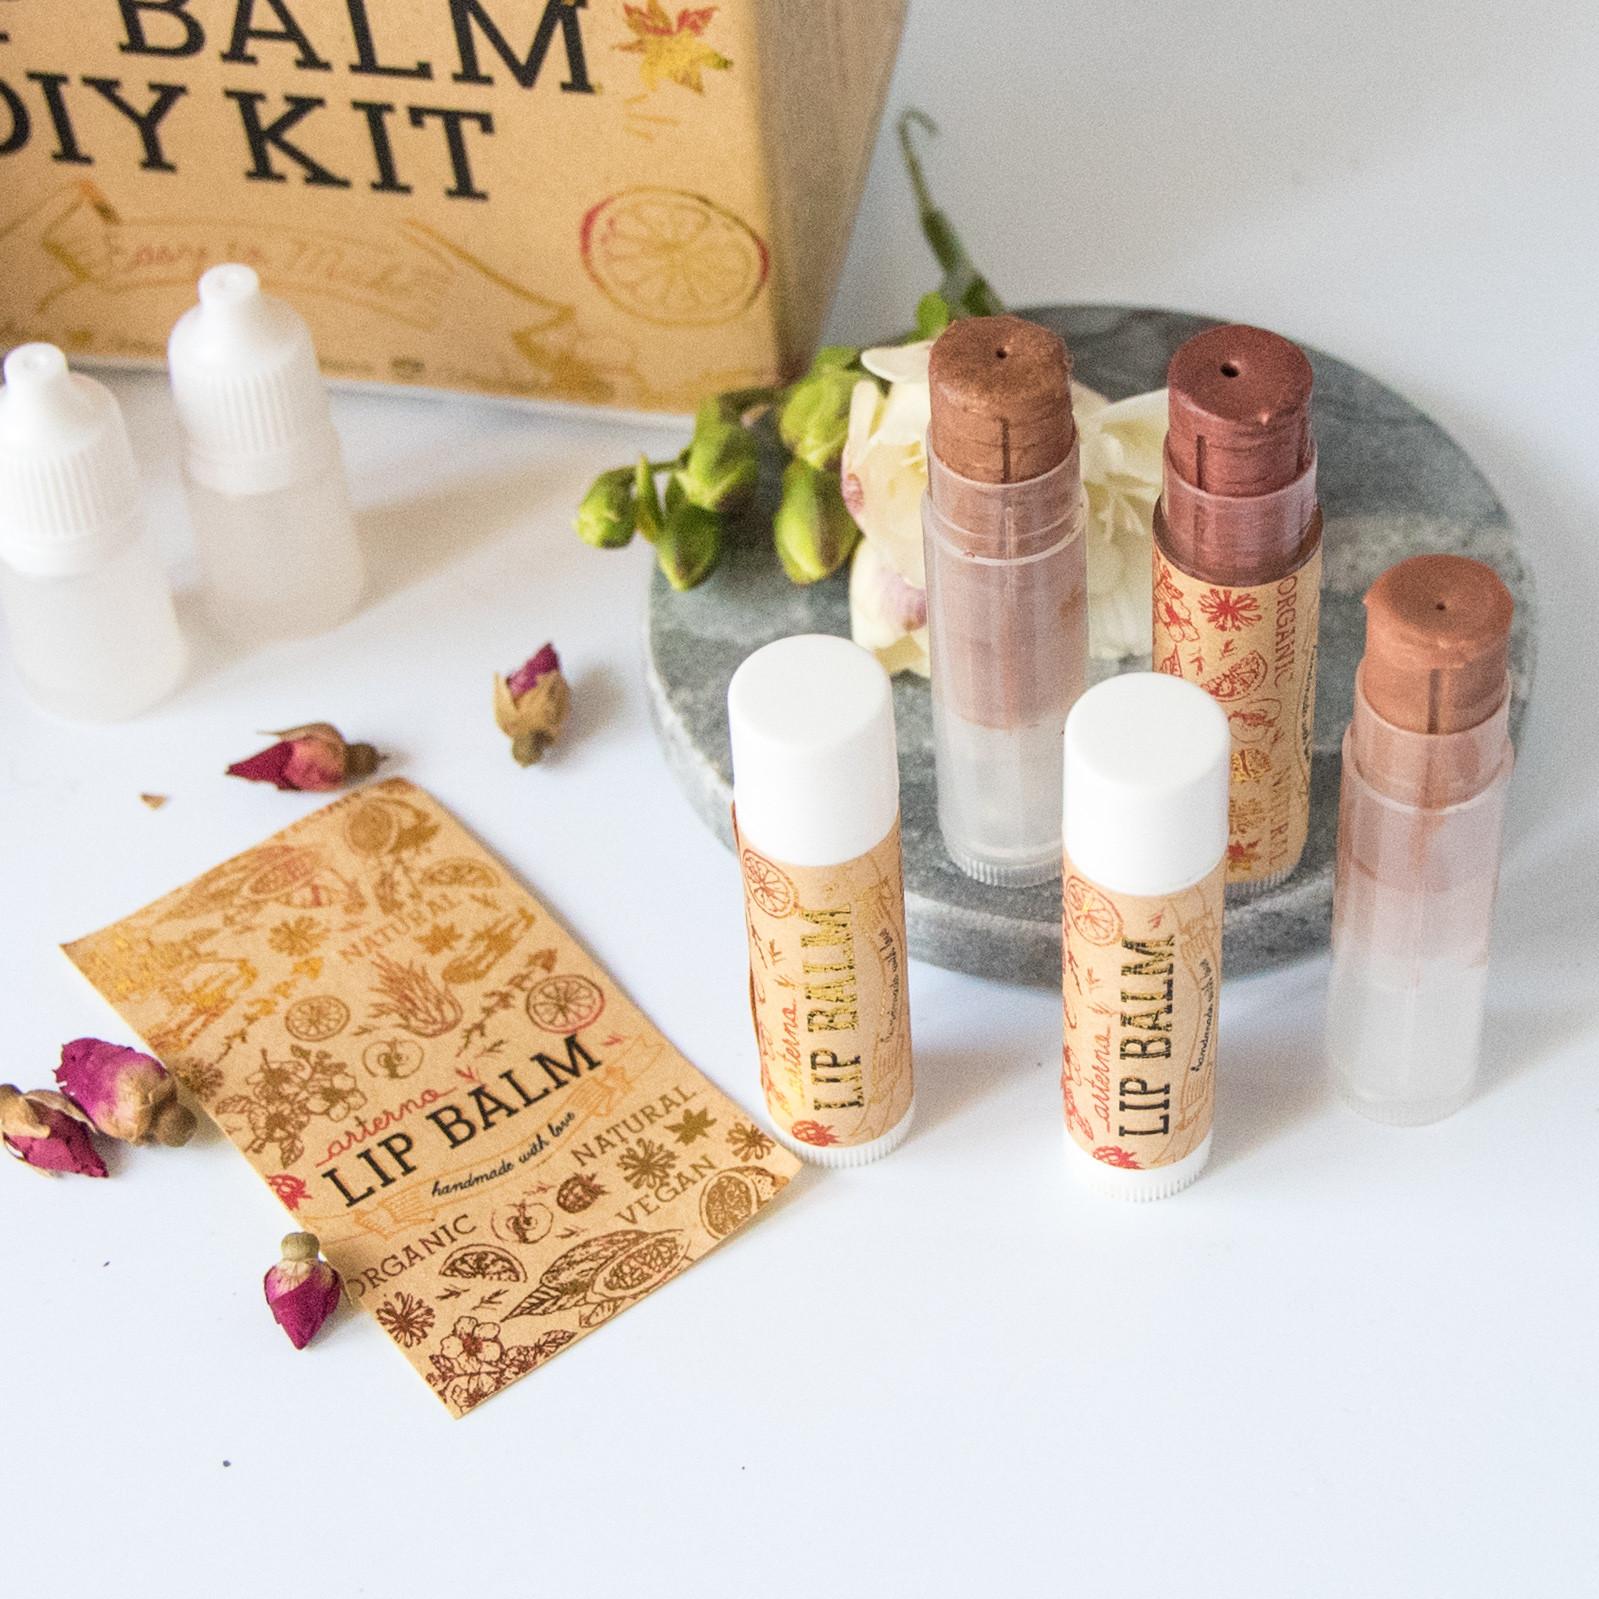 Best ideas about DIY Lip Balm Kit . Save or Pin DIY Lip Balm Organic Kit – ARTERNO Now.